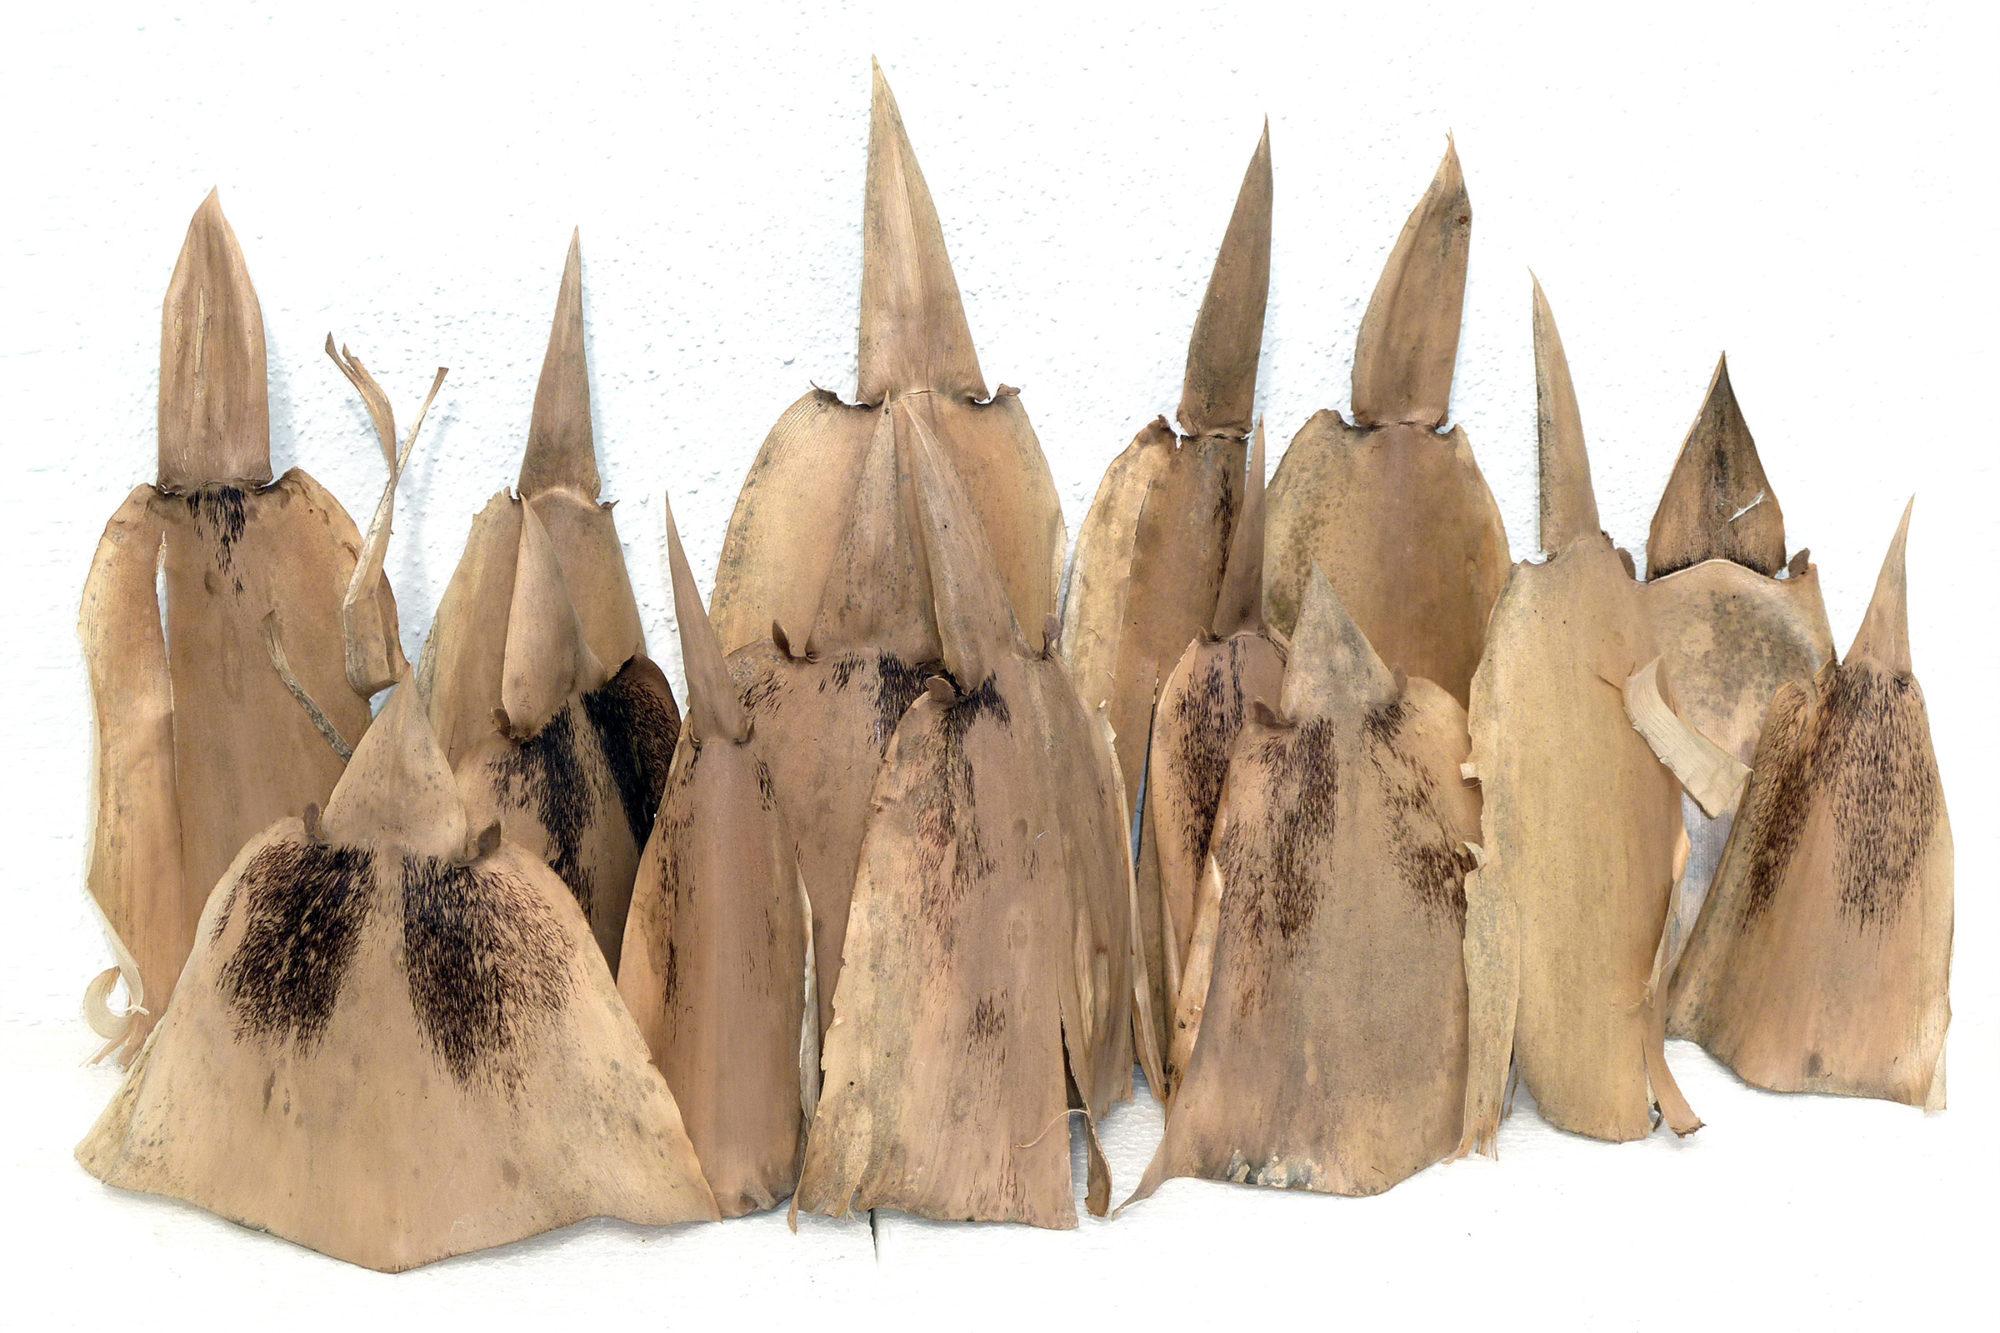 Bambusarmee 1